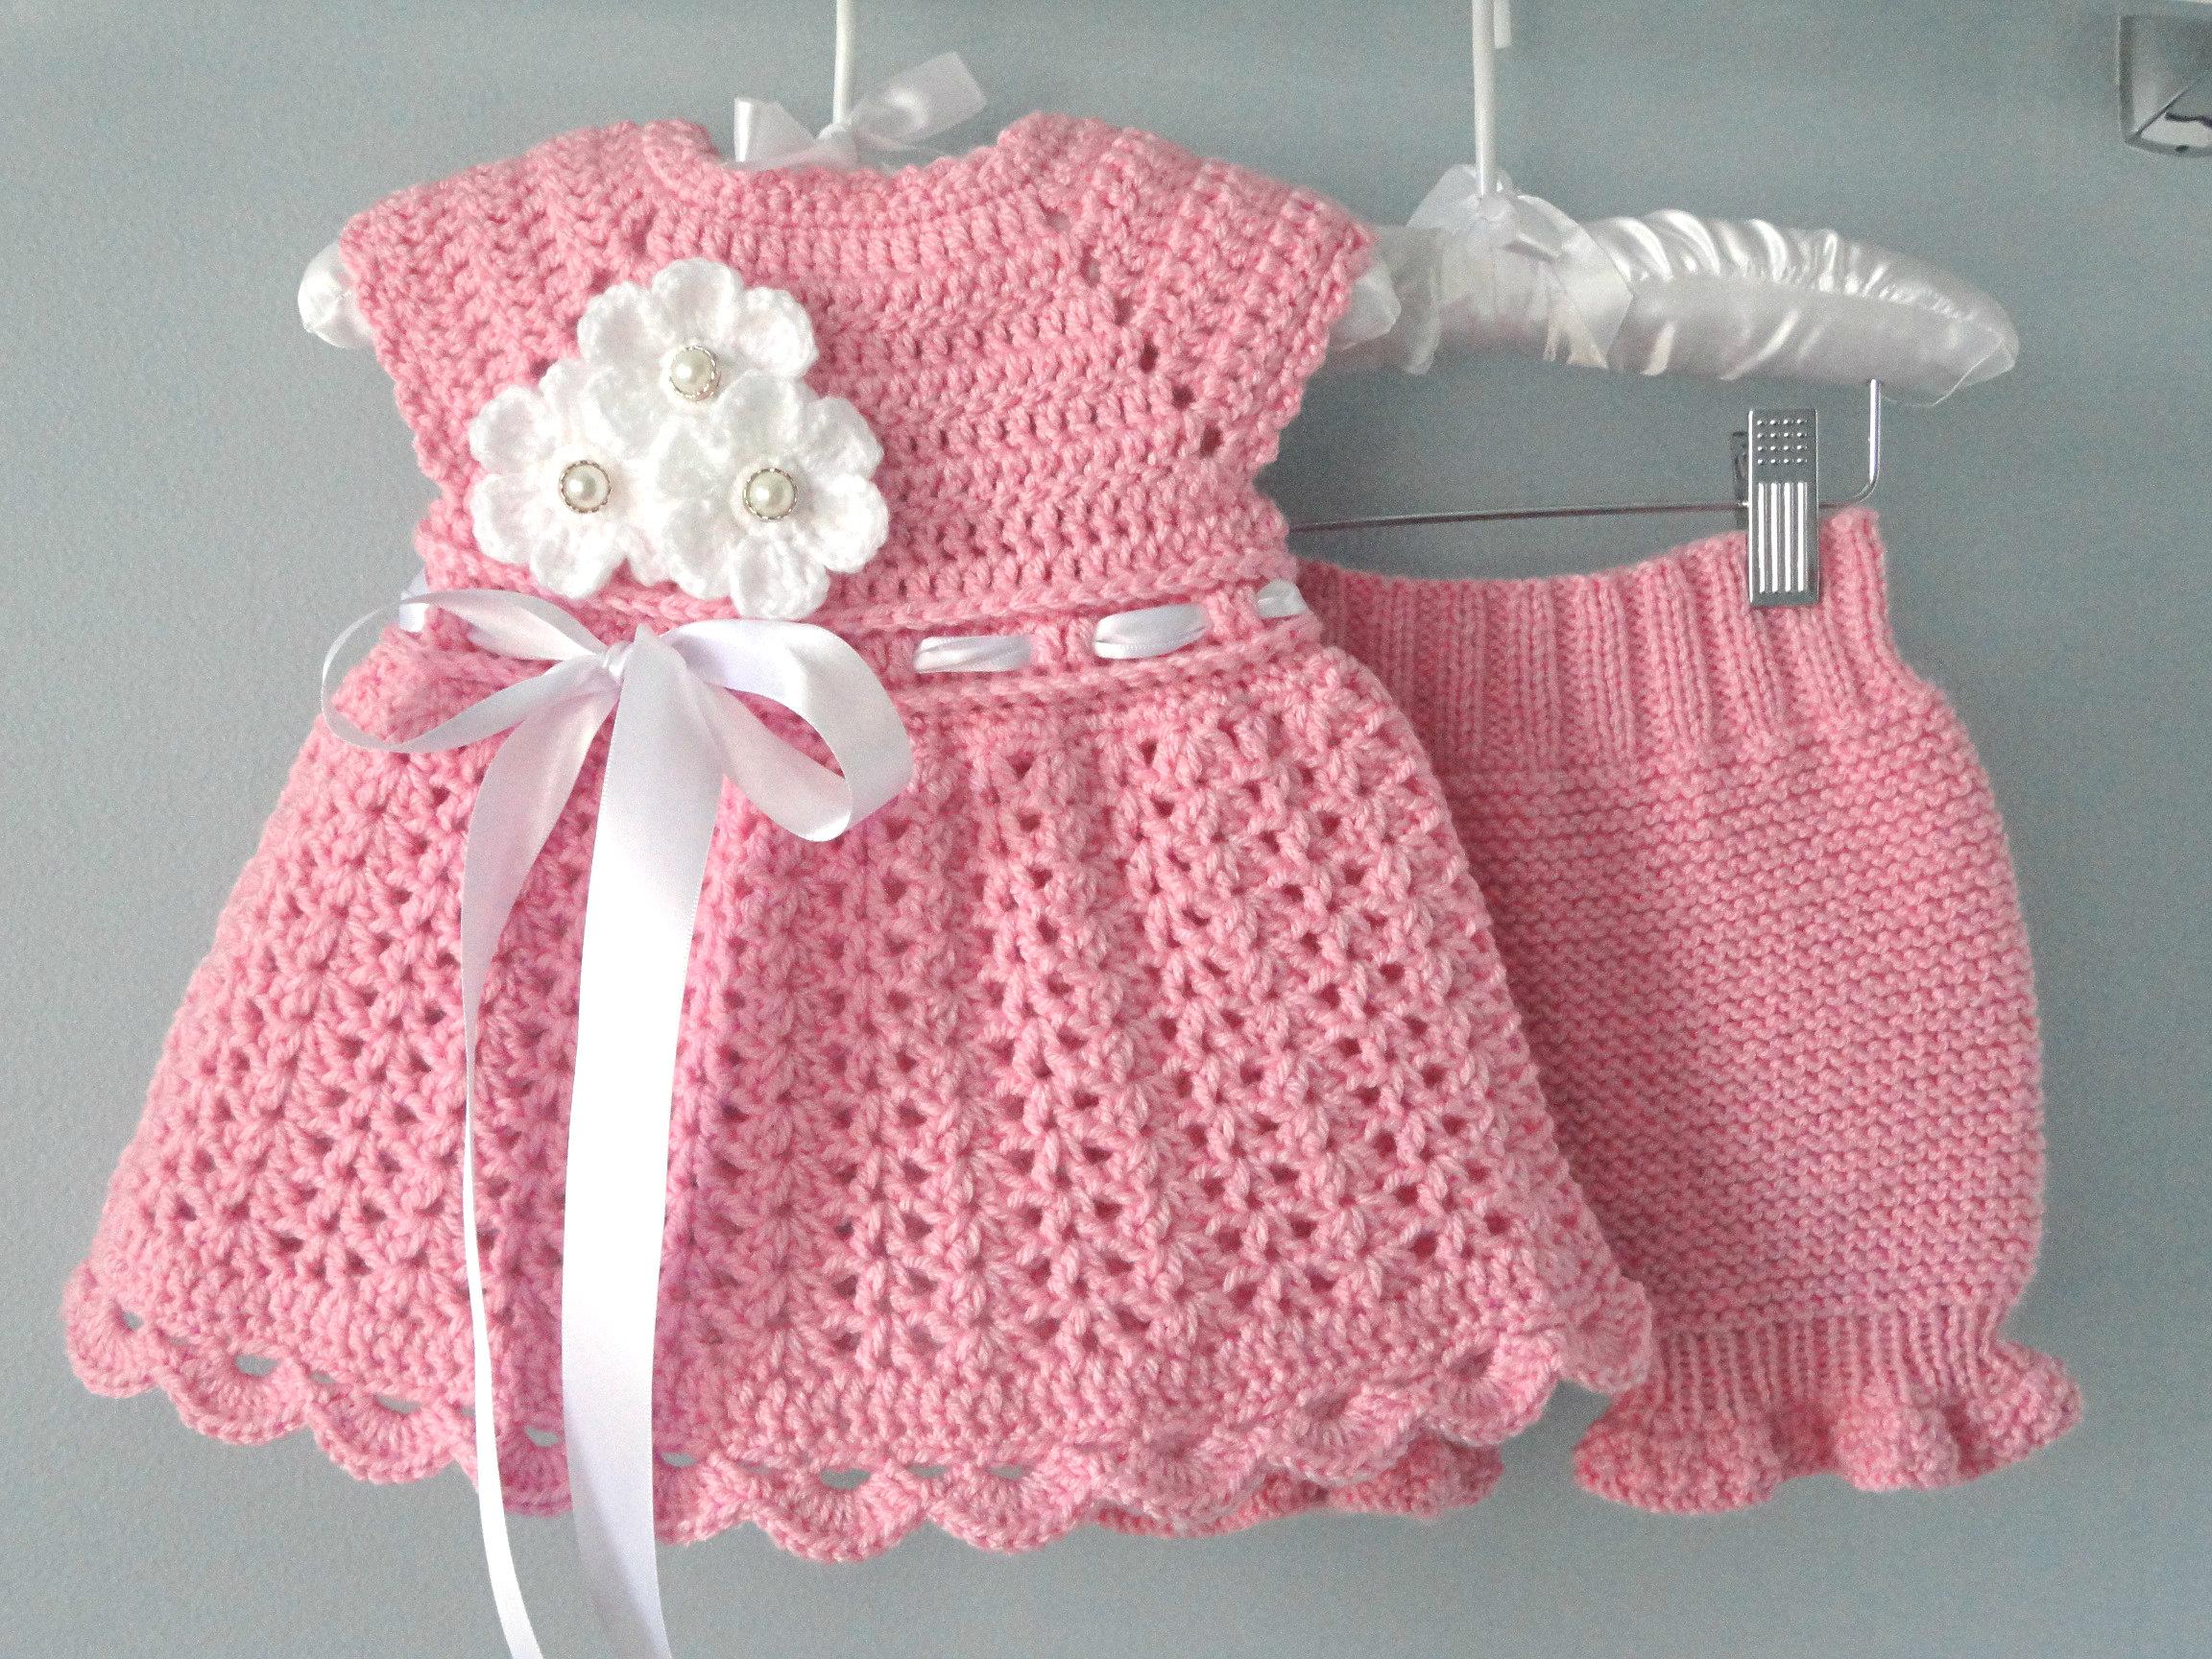 Crochet Baby Dress Set Knitted Diaper Cover Crochet Baby Pants Etsy